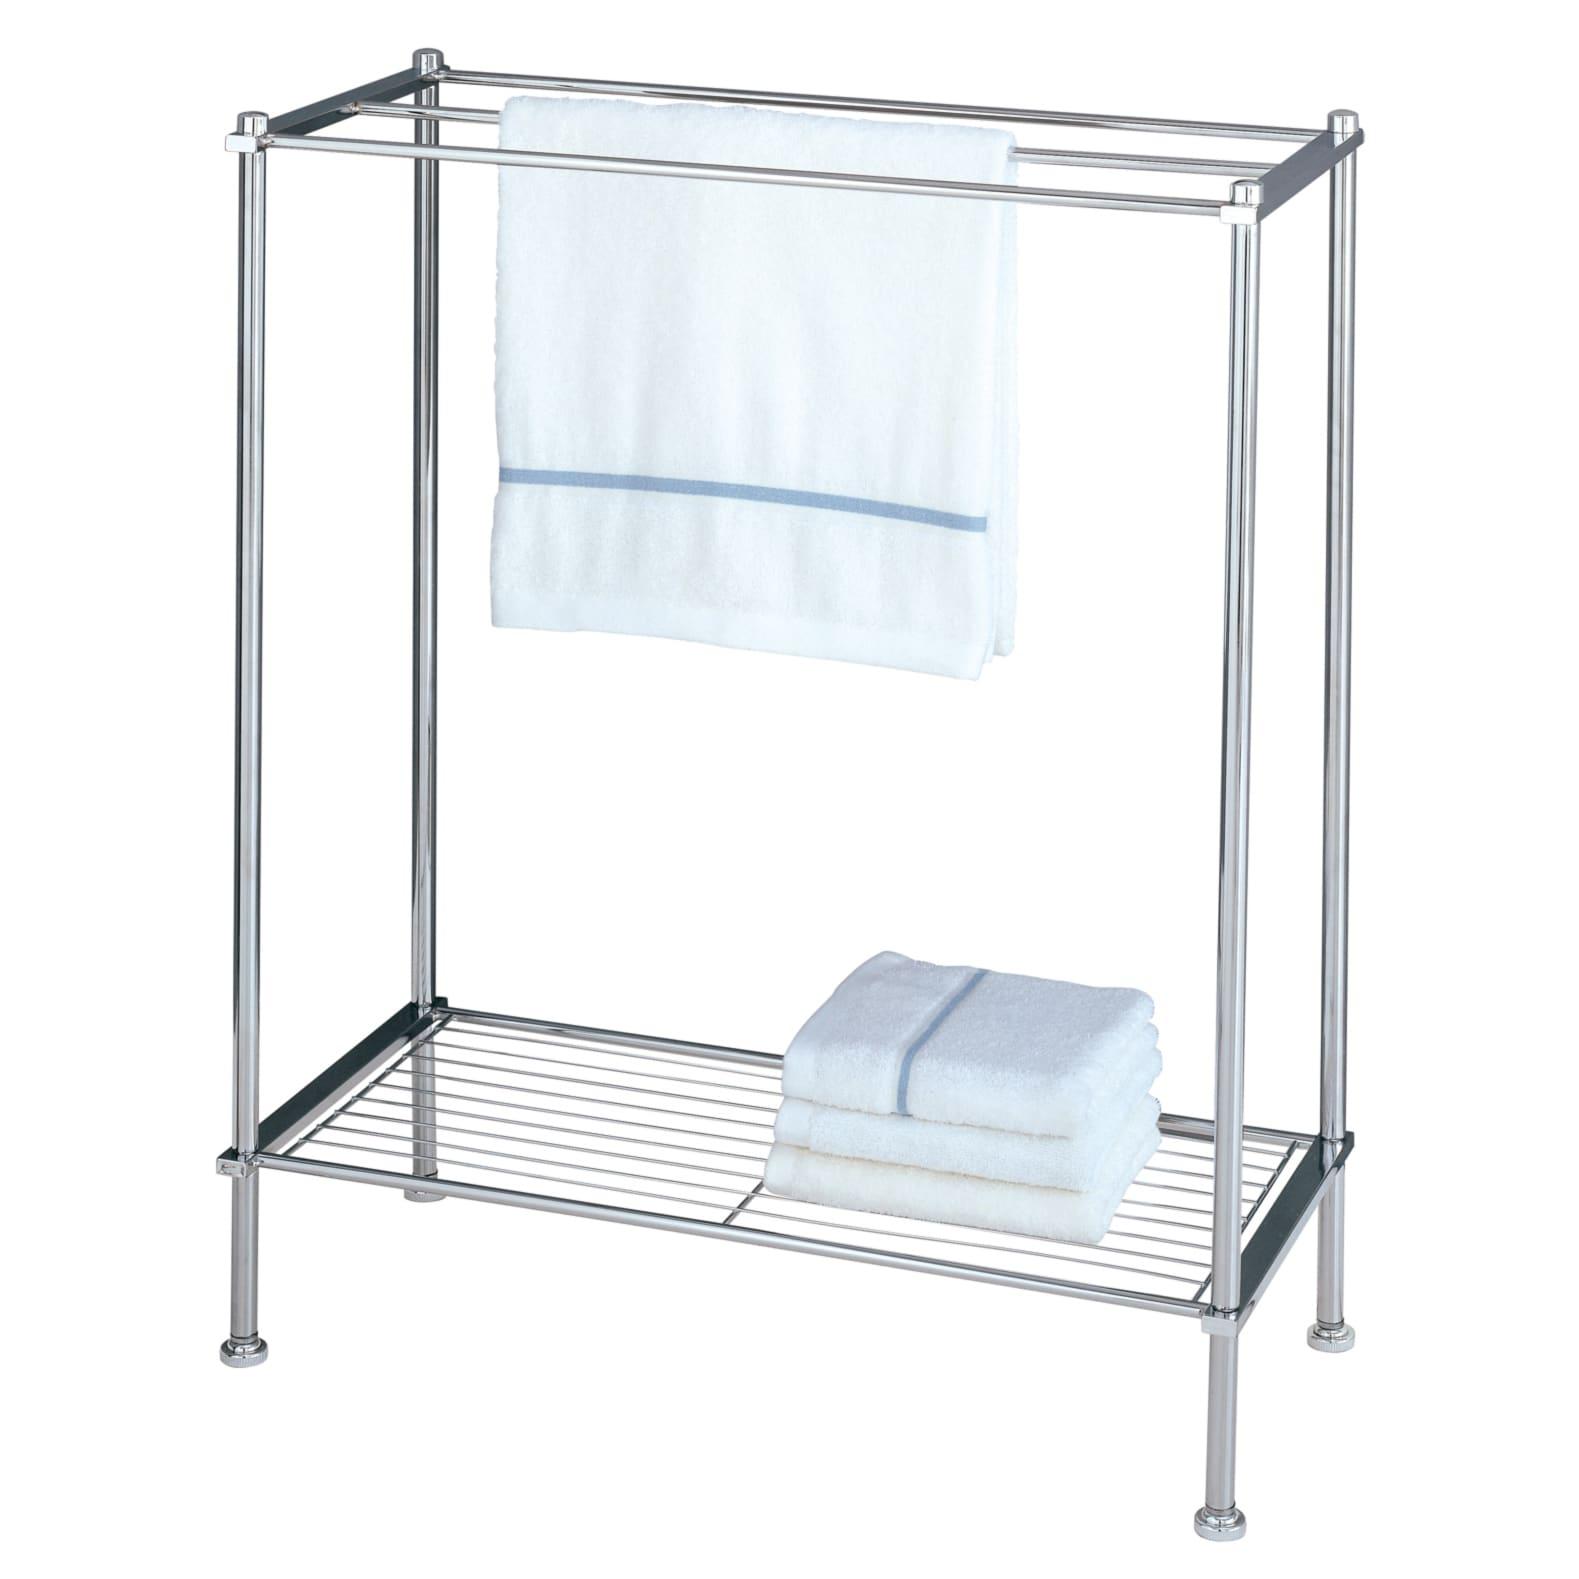 Organize It All Freestanding 3 Tier Chrome Bathroom Towel Rack